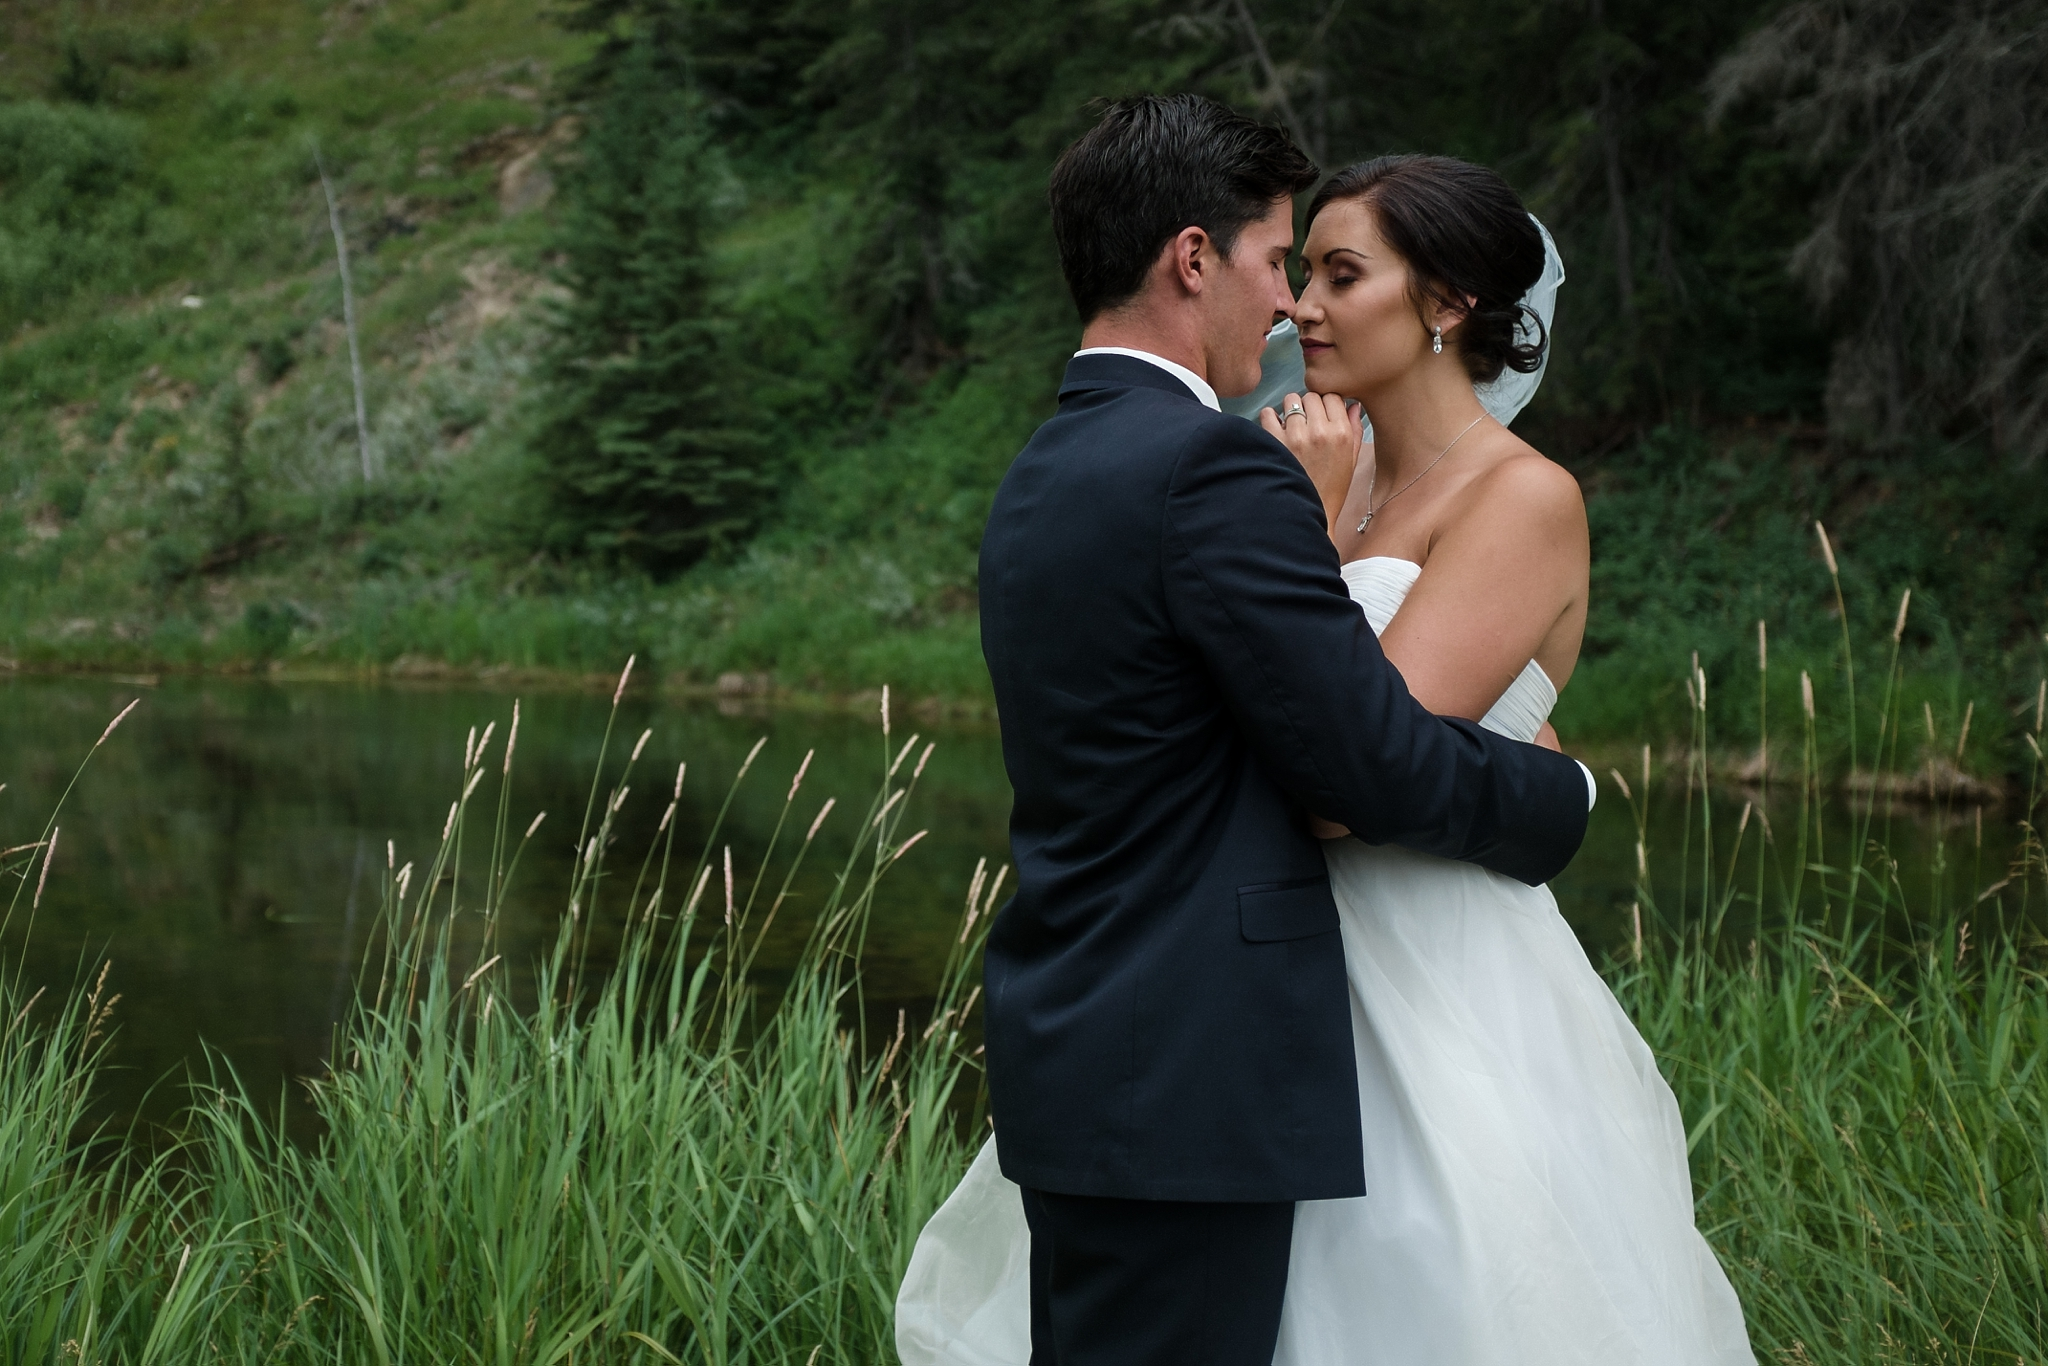 kaihla_tonai_intimate_wedding_elopement_photographer_0107